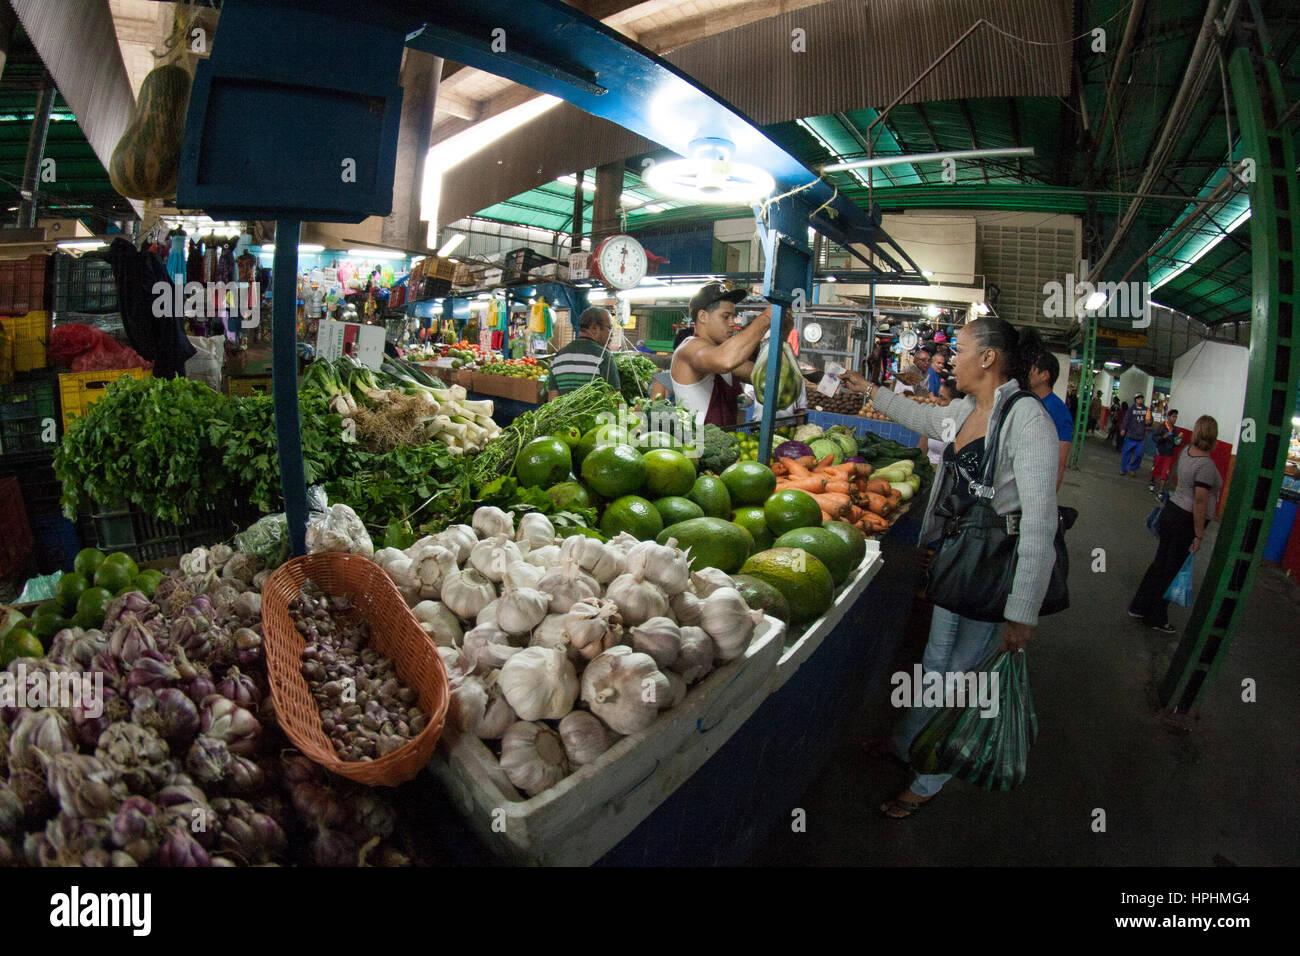 Caracas, Dtto Capital / Venezuela - 04-02-2012 : People buying in a famous popular market in San Martín Avenue. - Stock Image